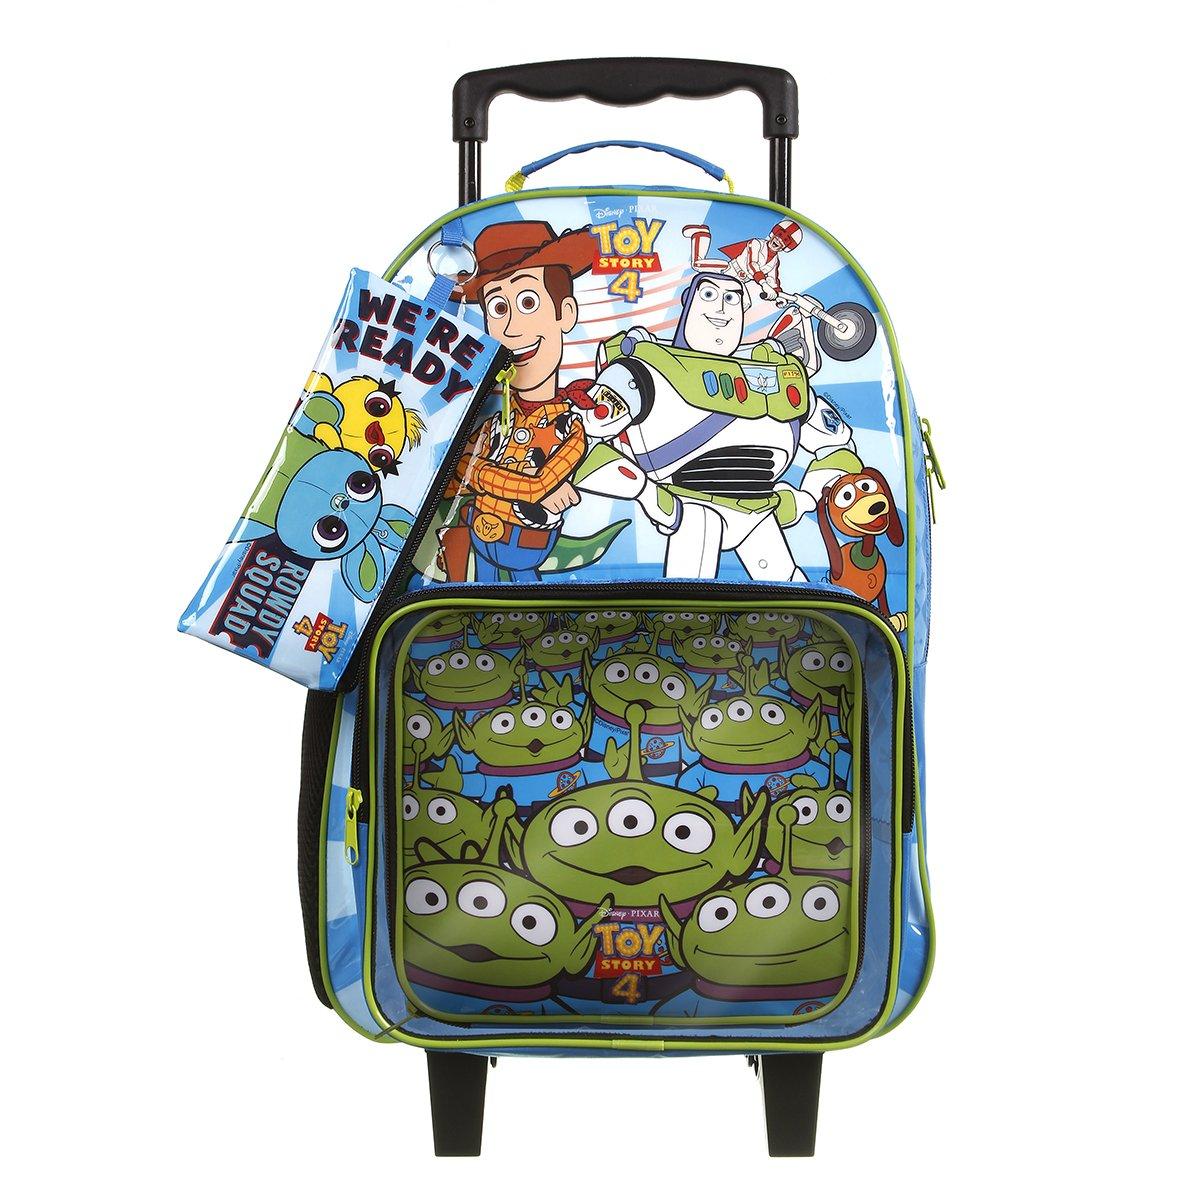 Kit Escolar Toy Story Mochila + Lancheira + Estojo Azul